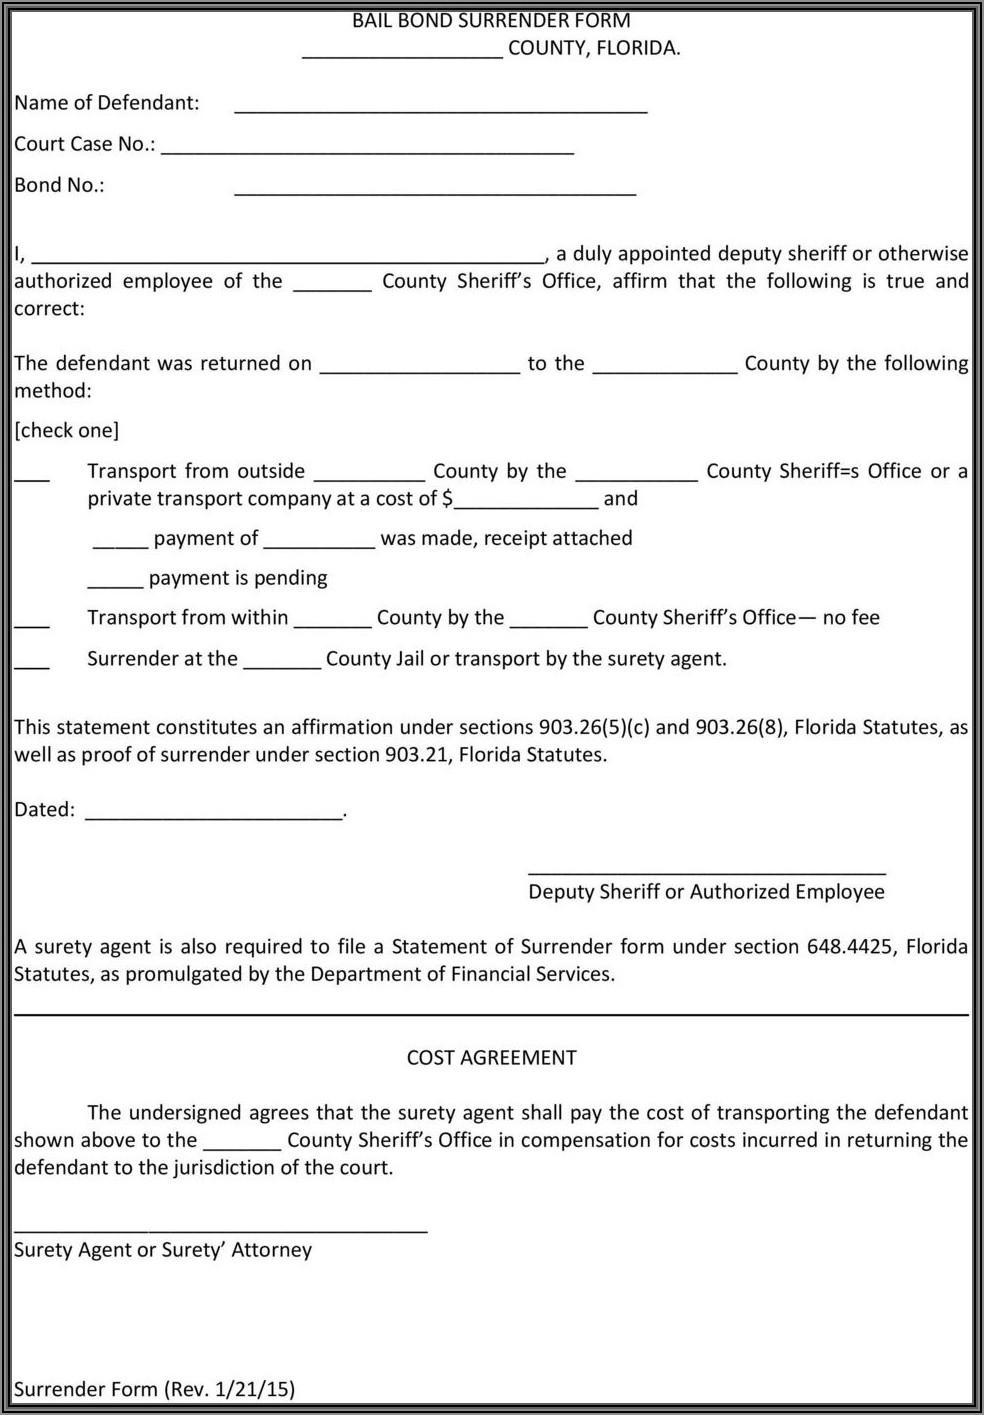 Surety Bond Form (mvt 4 3)